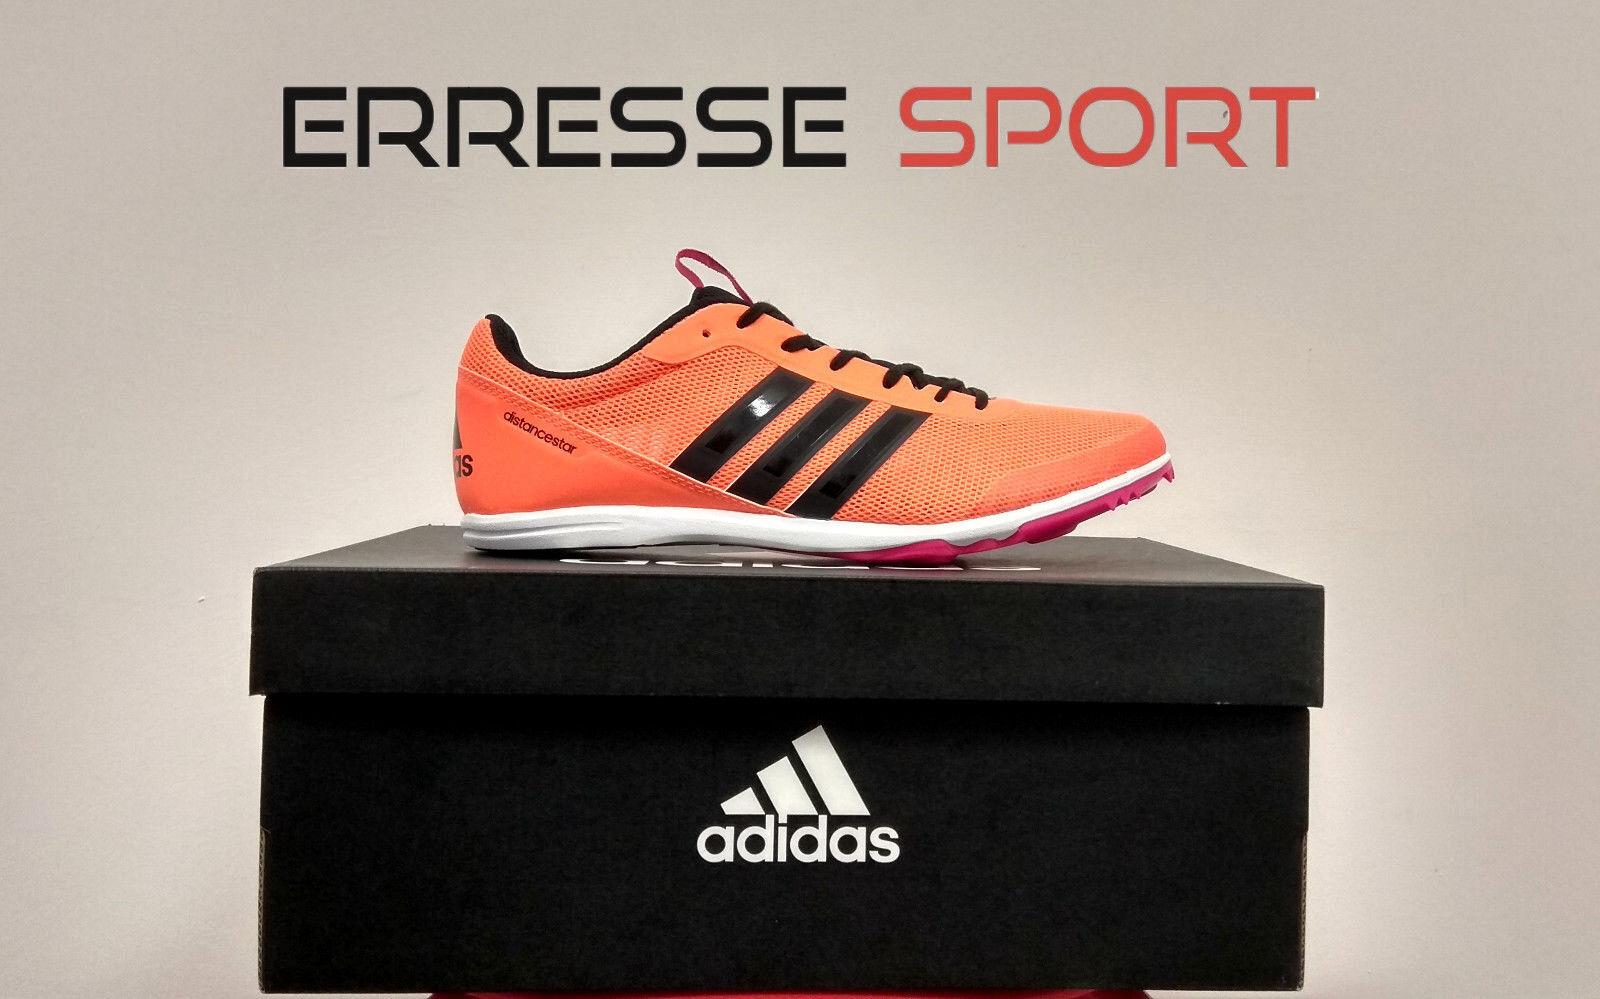 Adidas Distancestar chaussures crampons athlétisme demi bas athletic field